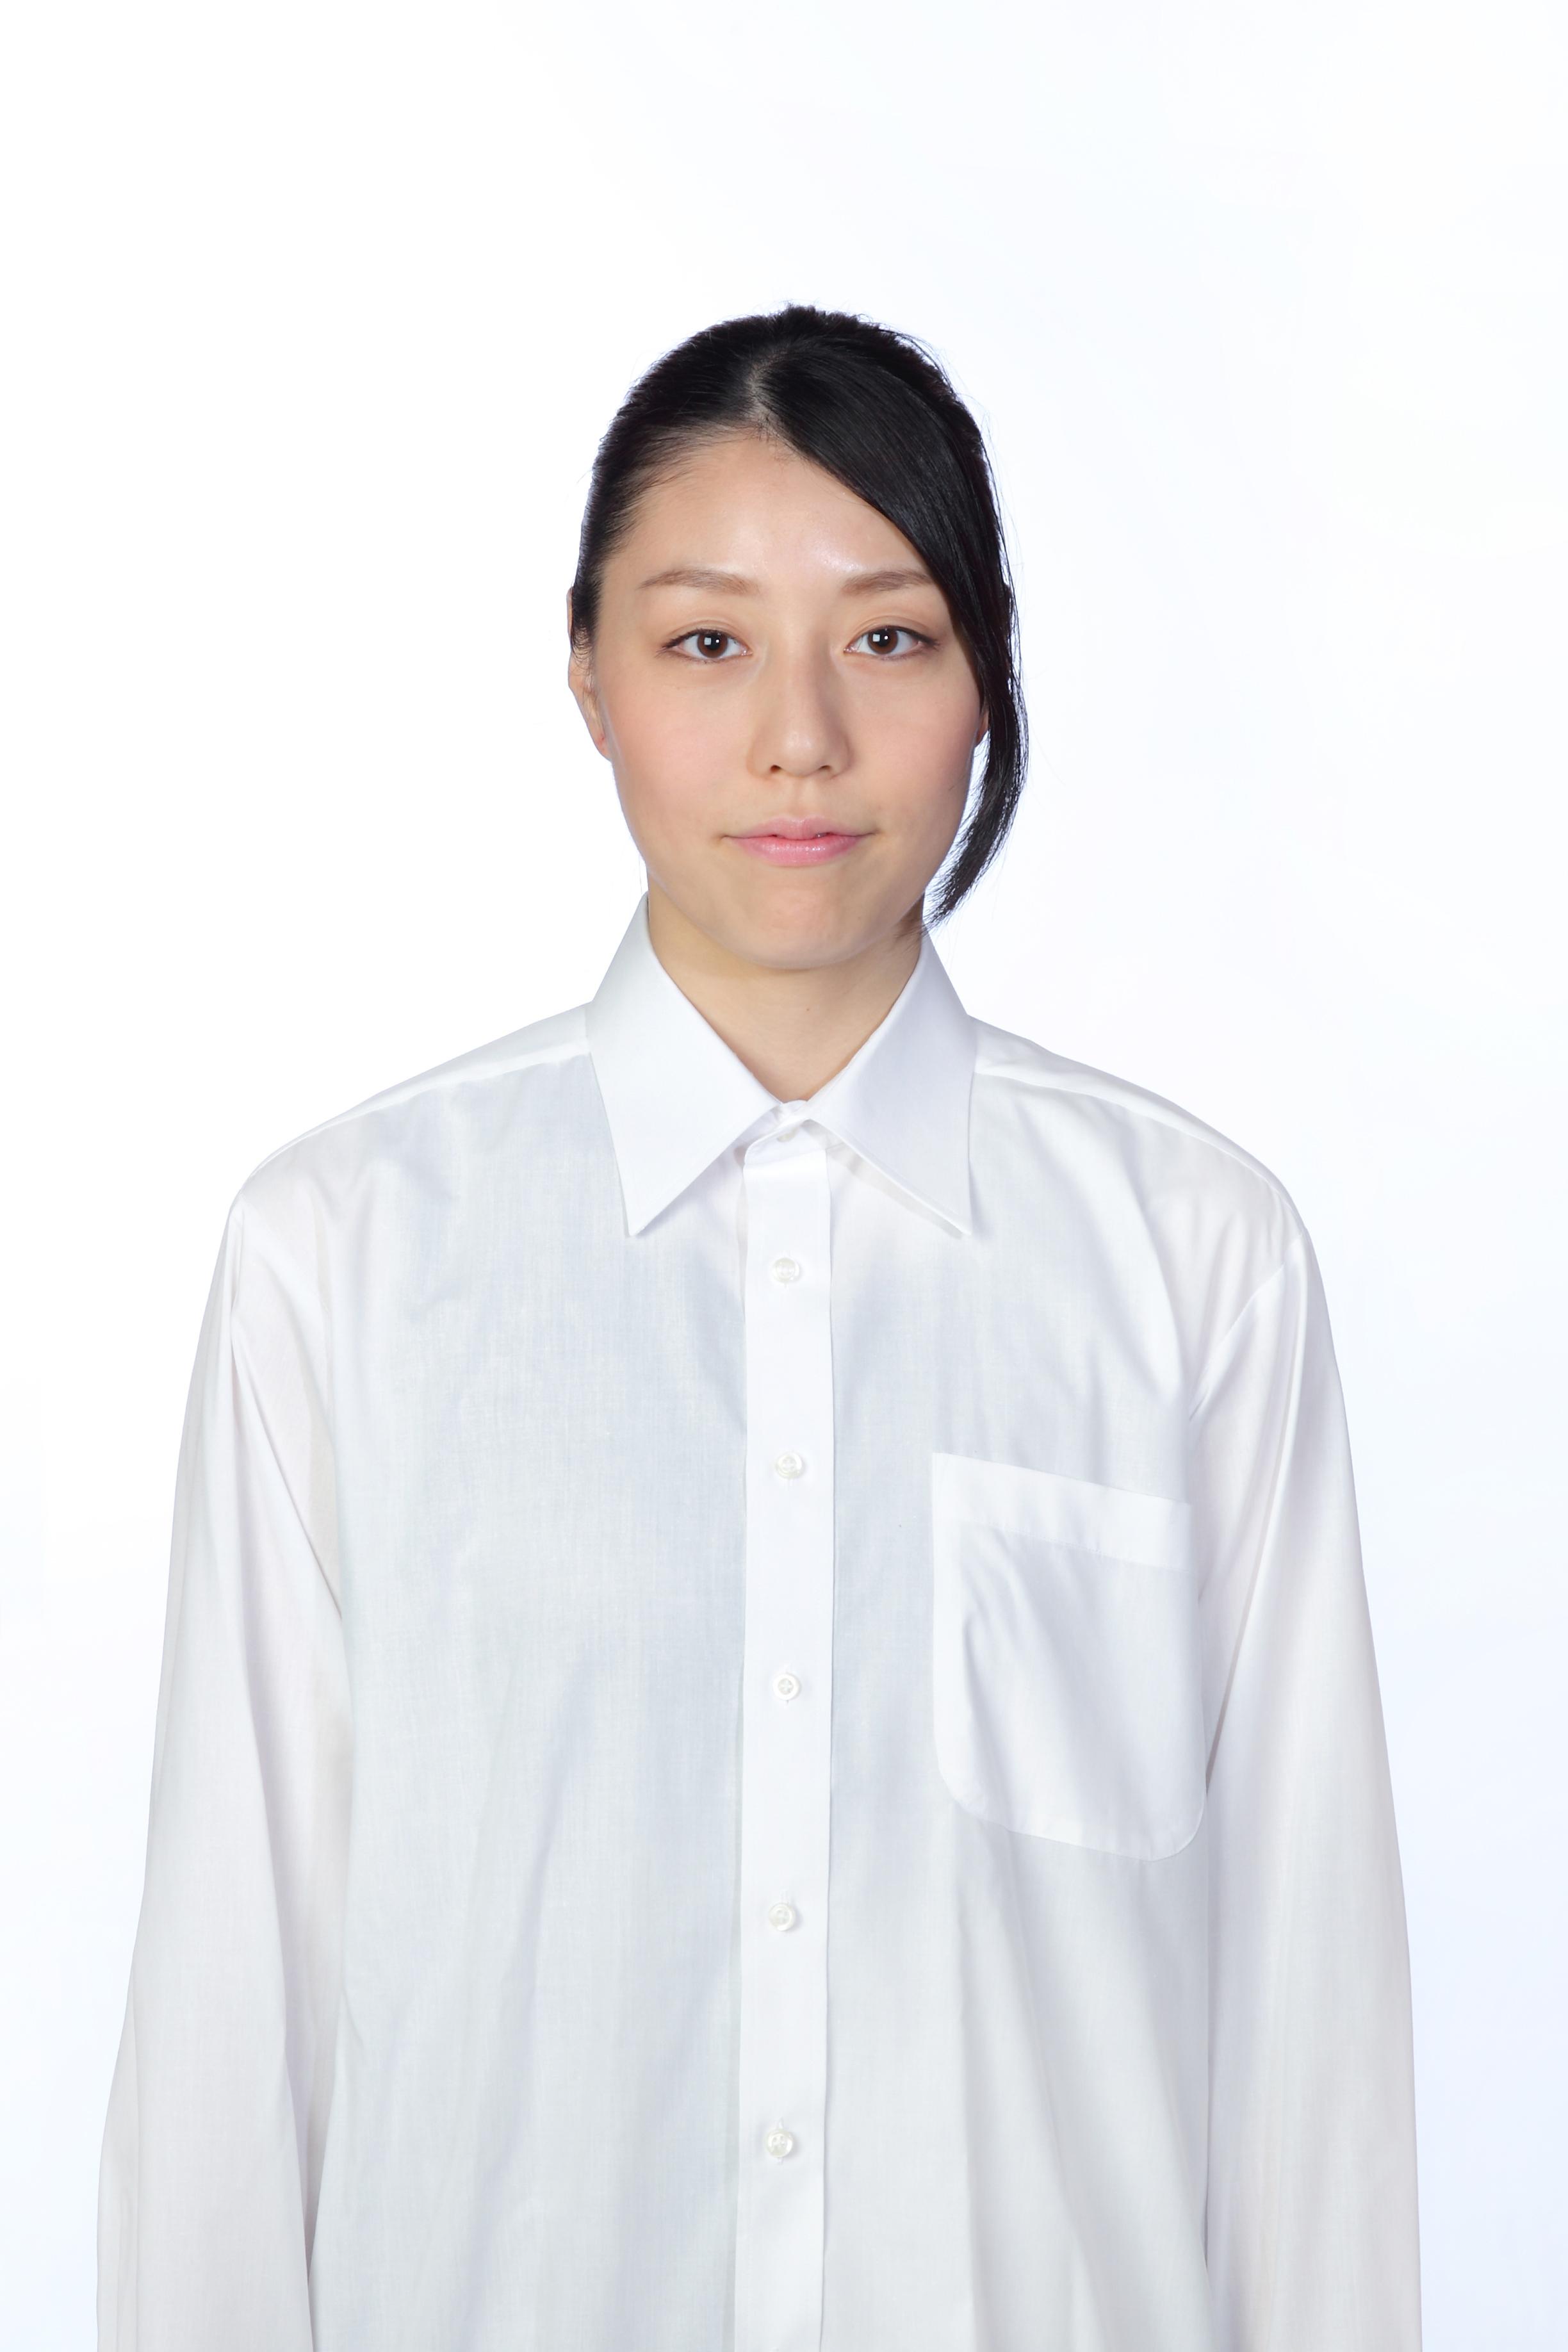 Miku Namba